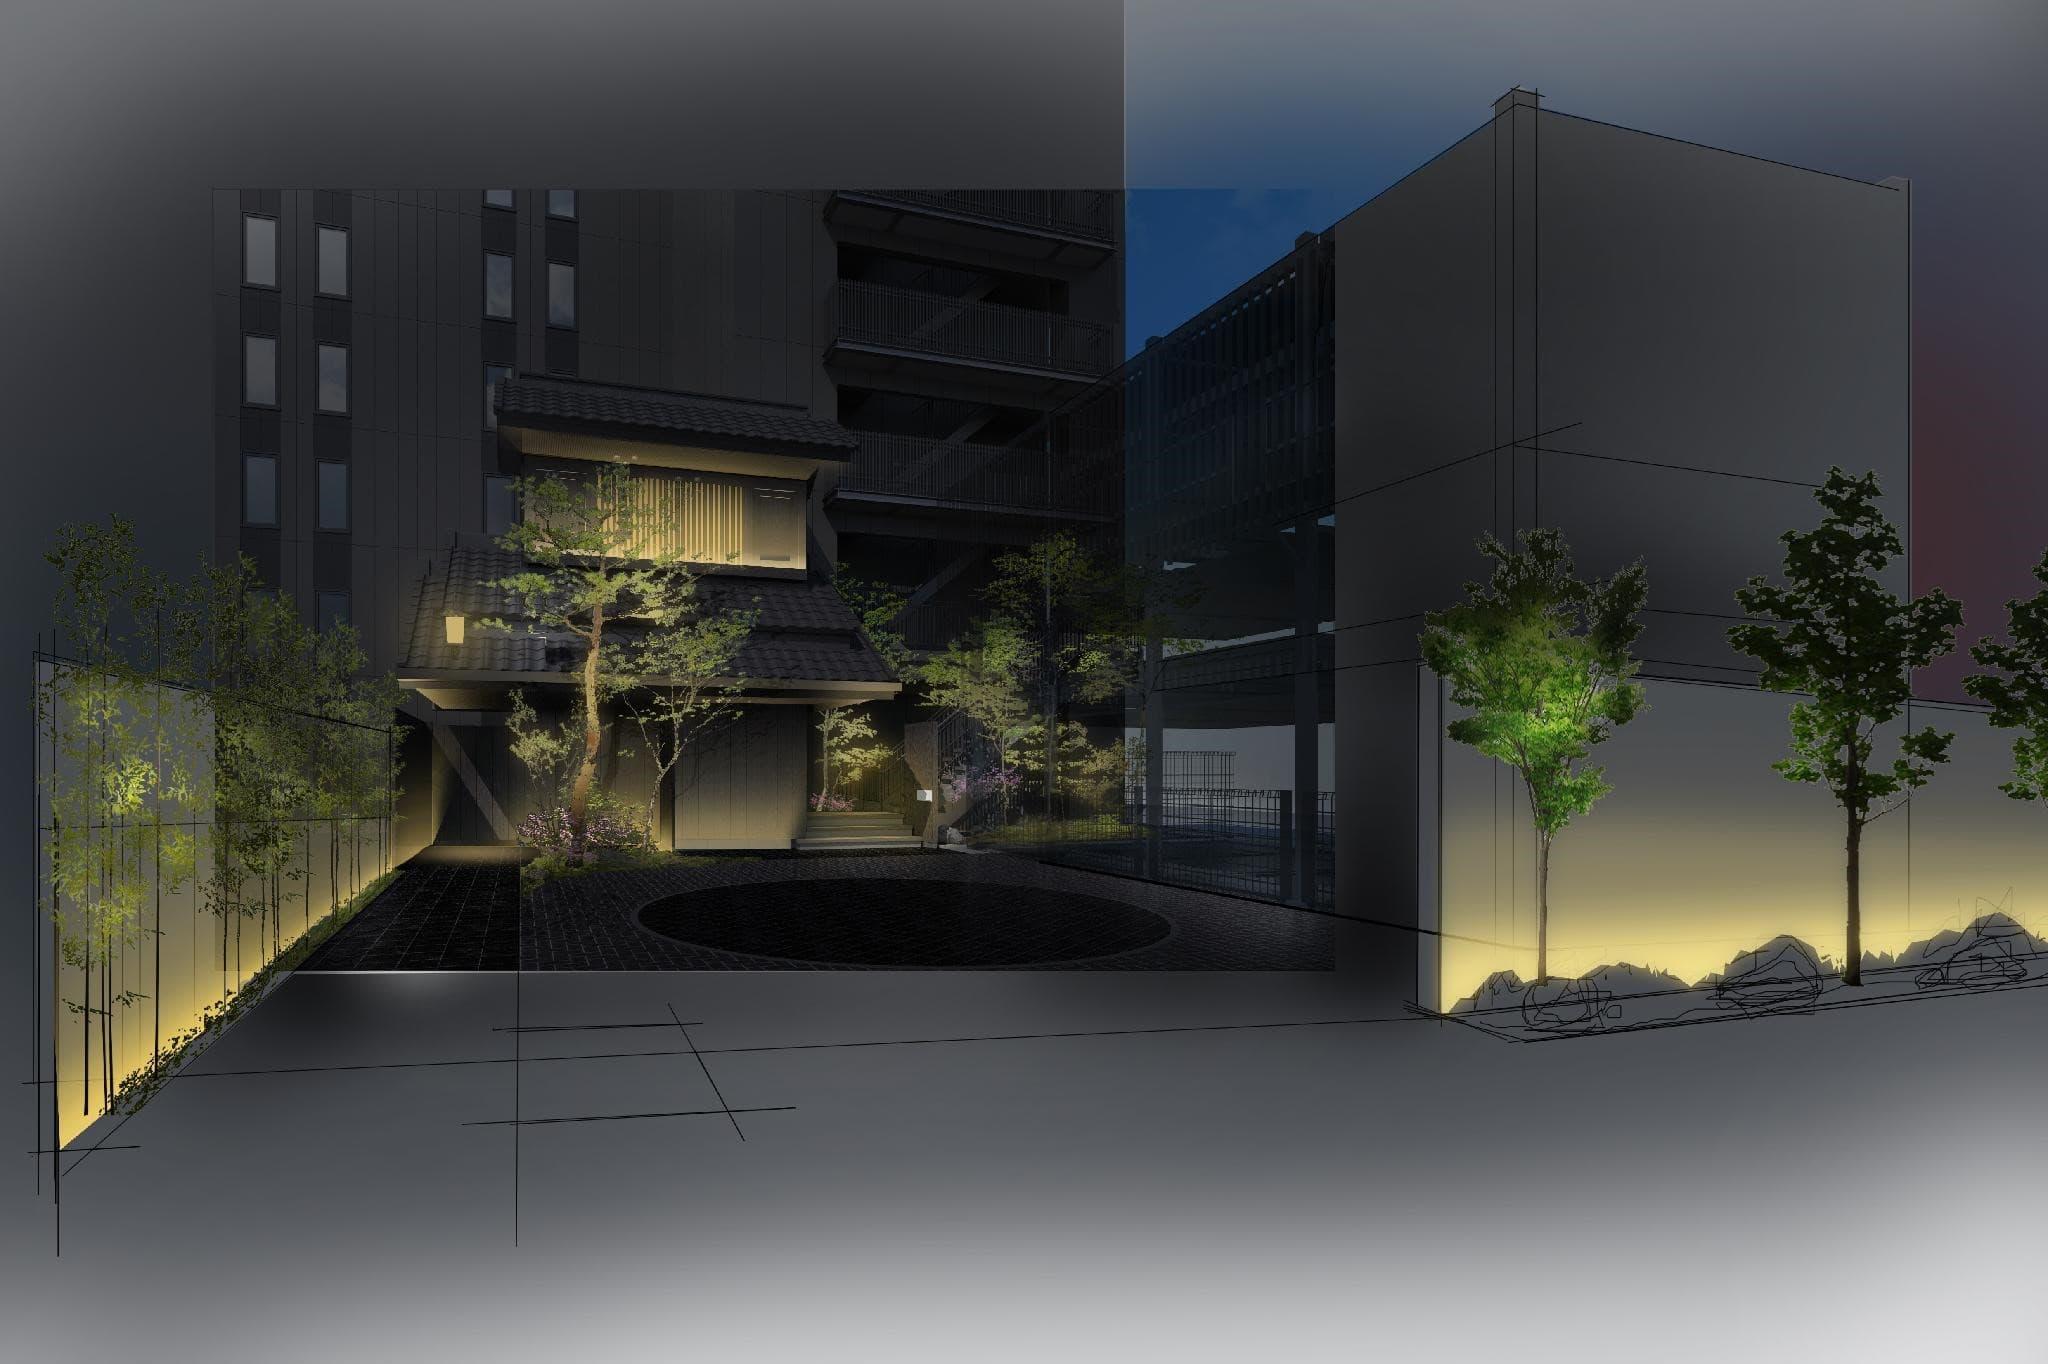 大阪 Resol Trinity 酒店